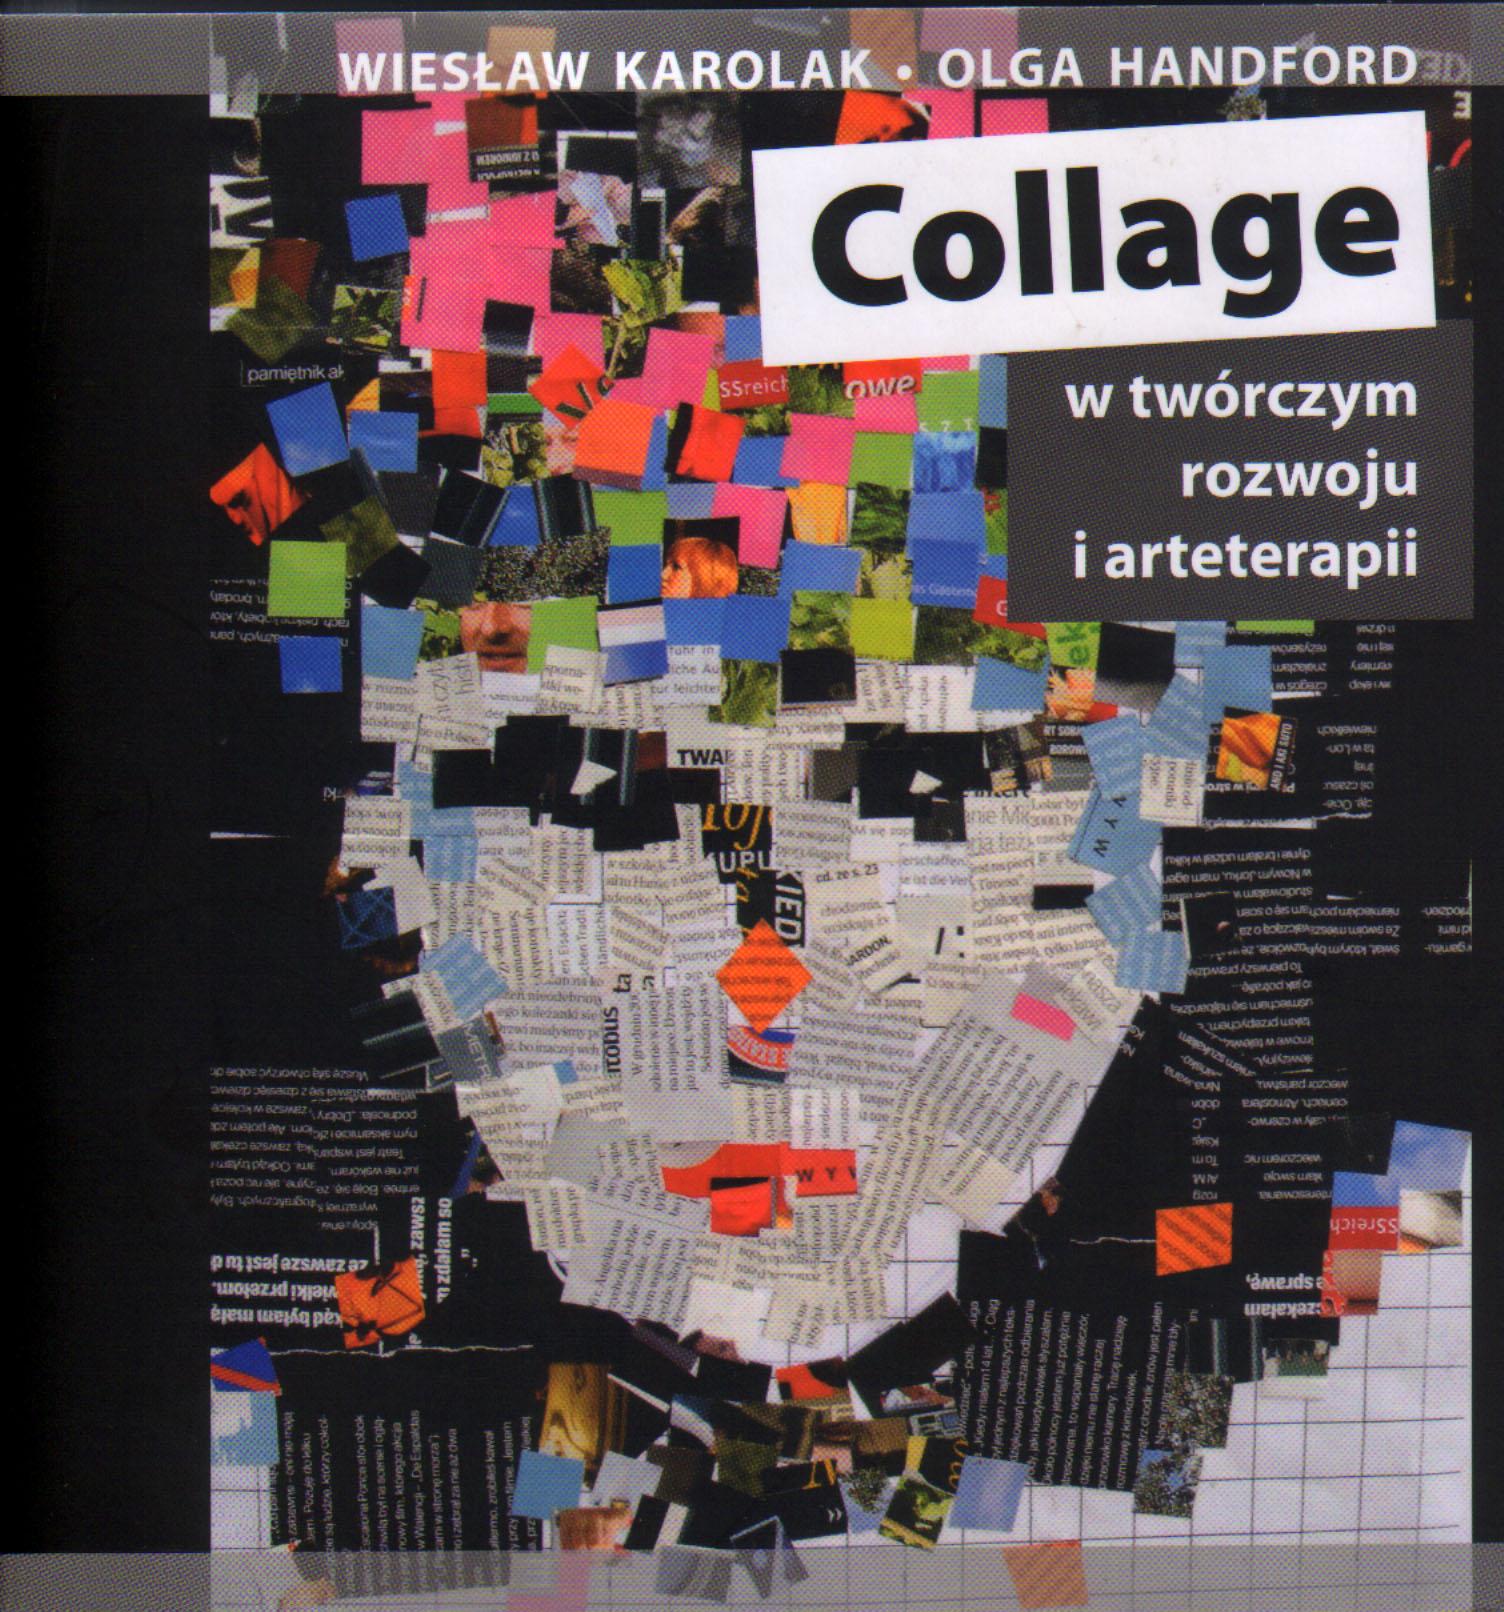 3 b Collage